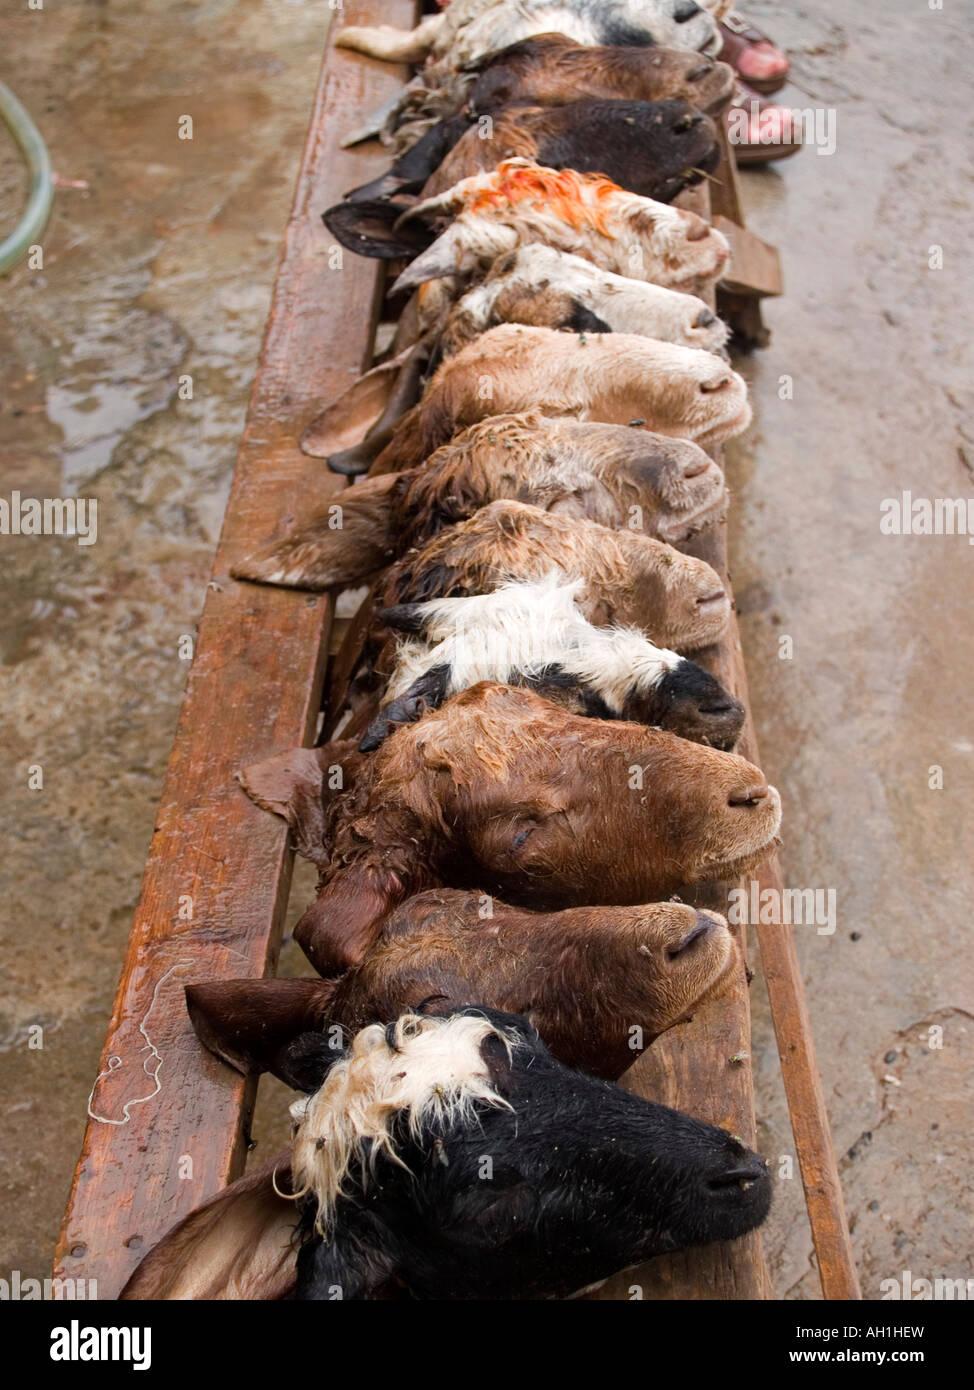 goat heads in the market in Afghan Bazaar Peshwar Pakistan Stock